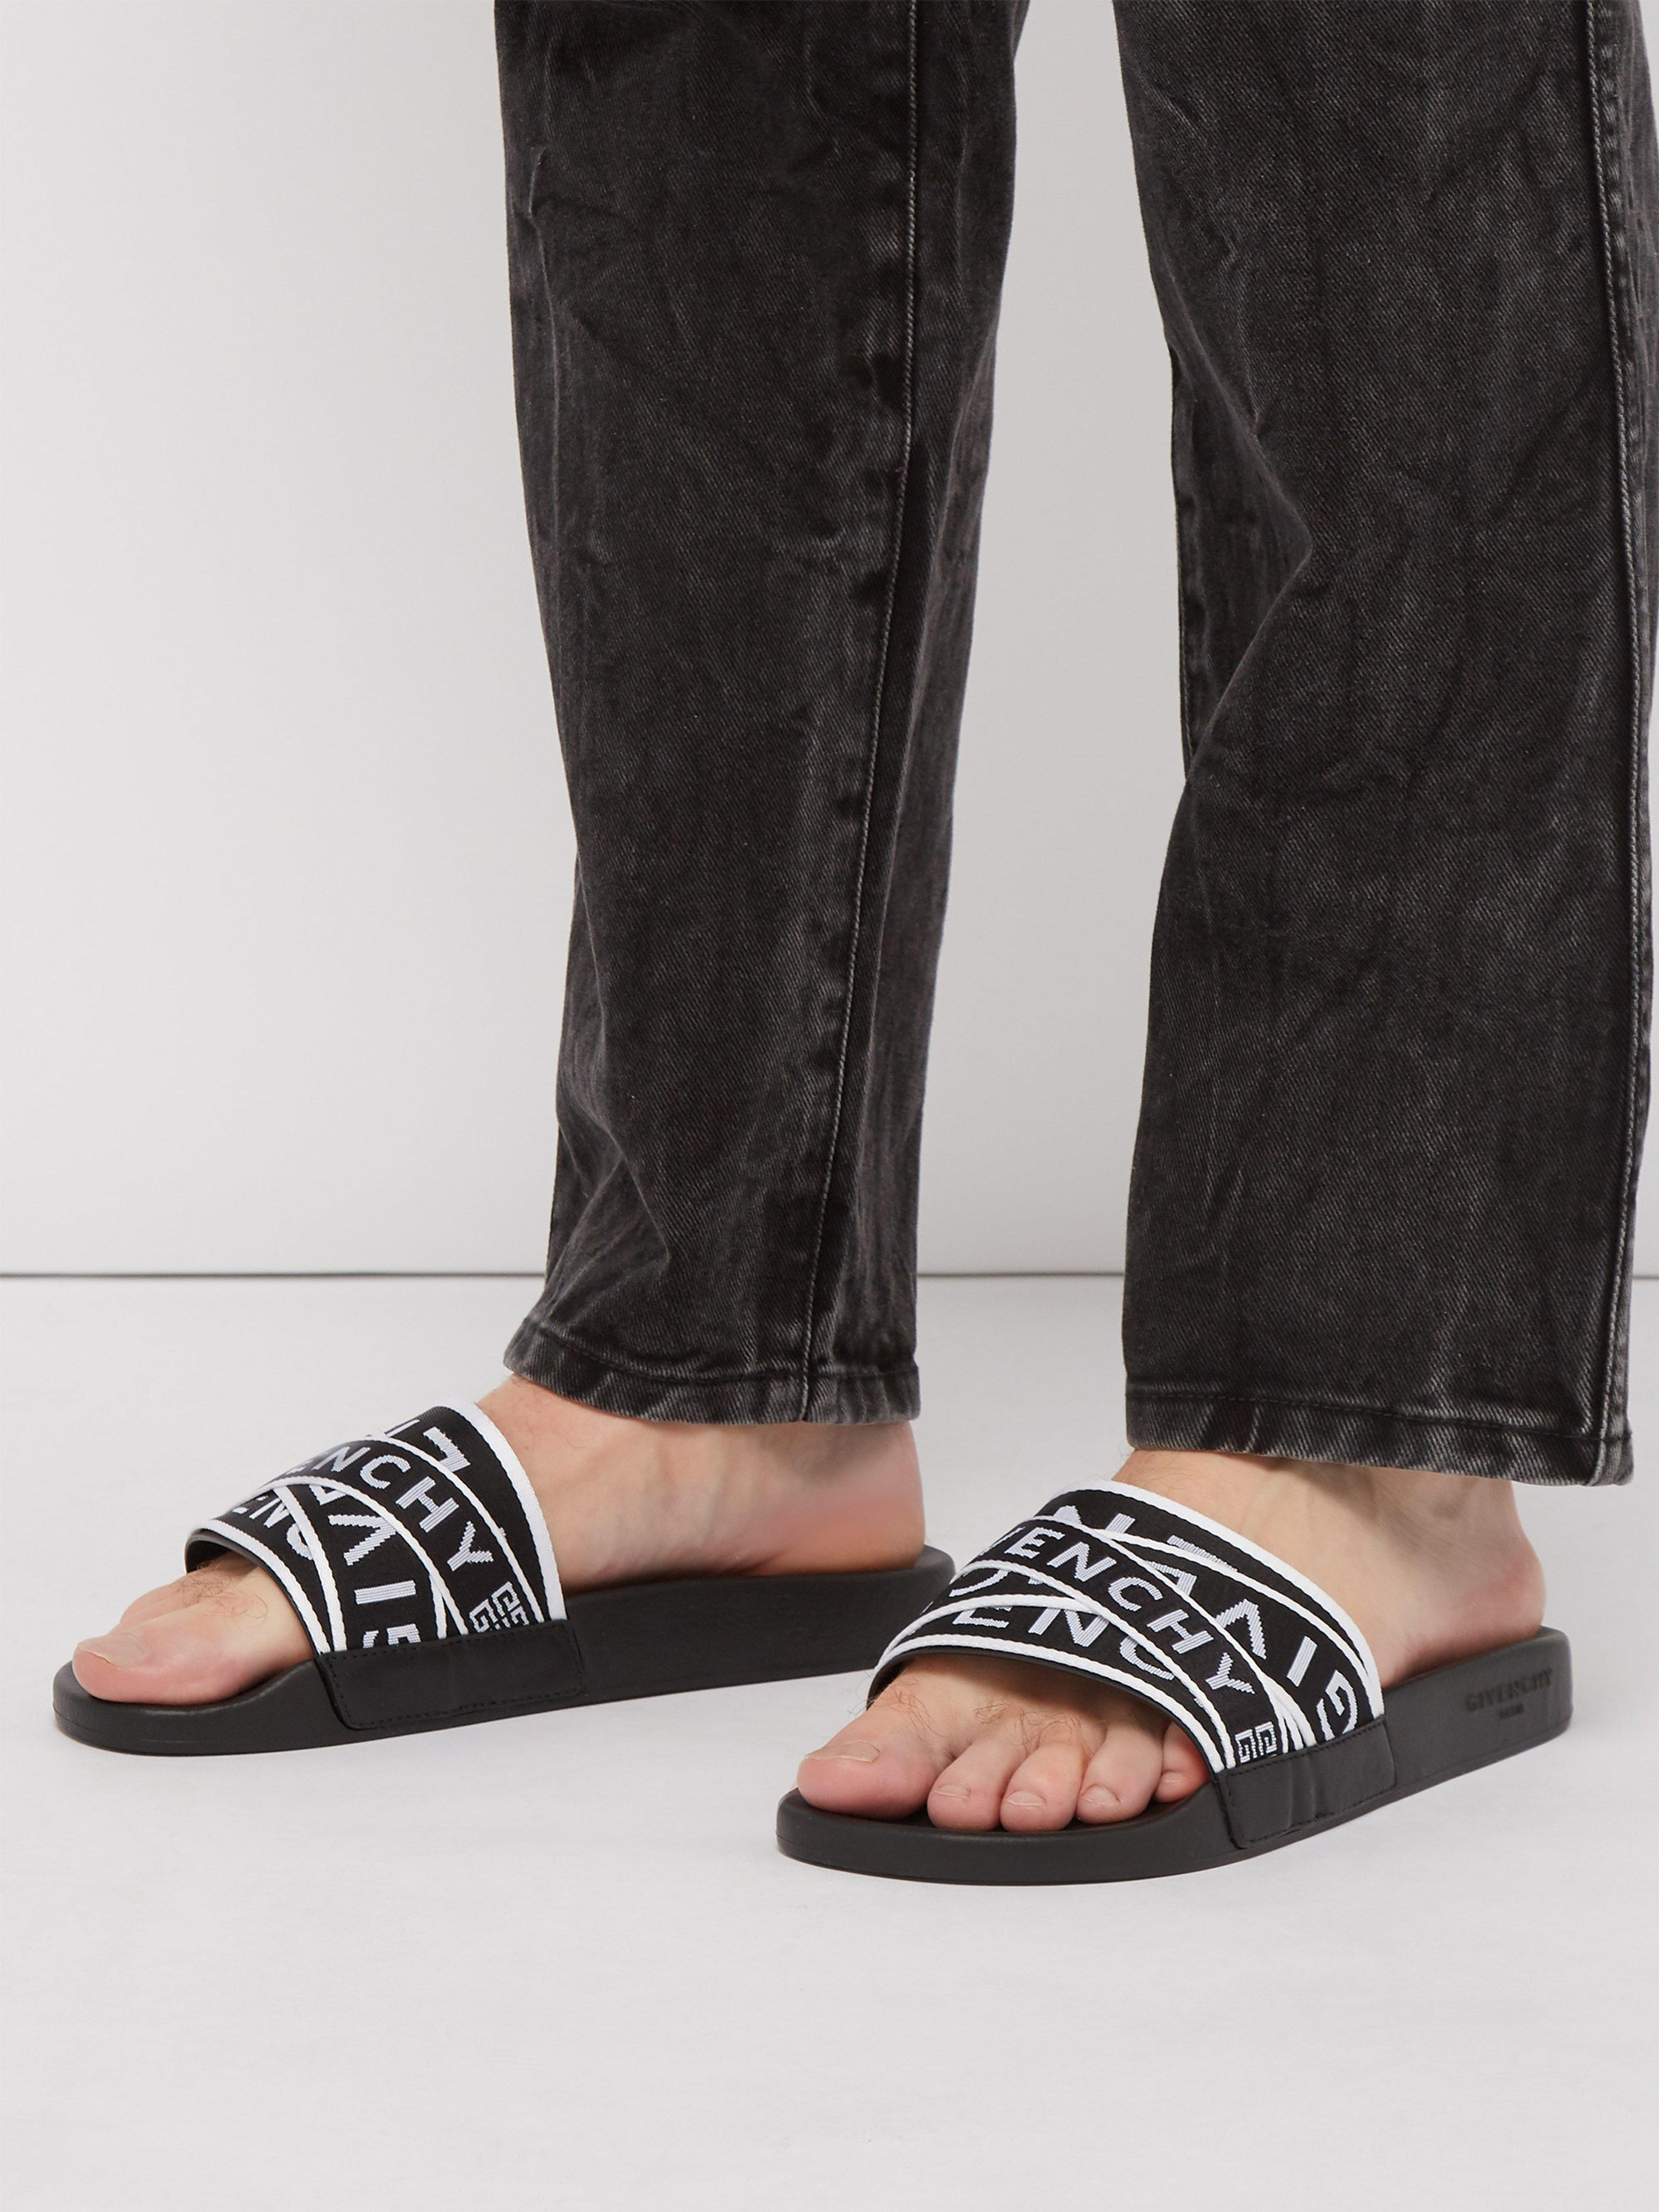 bdbb5527528 Givenchy Logo Strap Sliders in Black for Men - Lyst